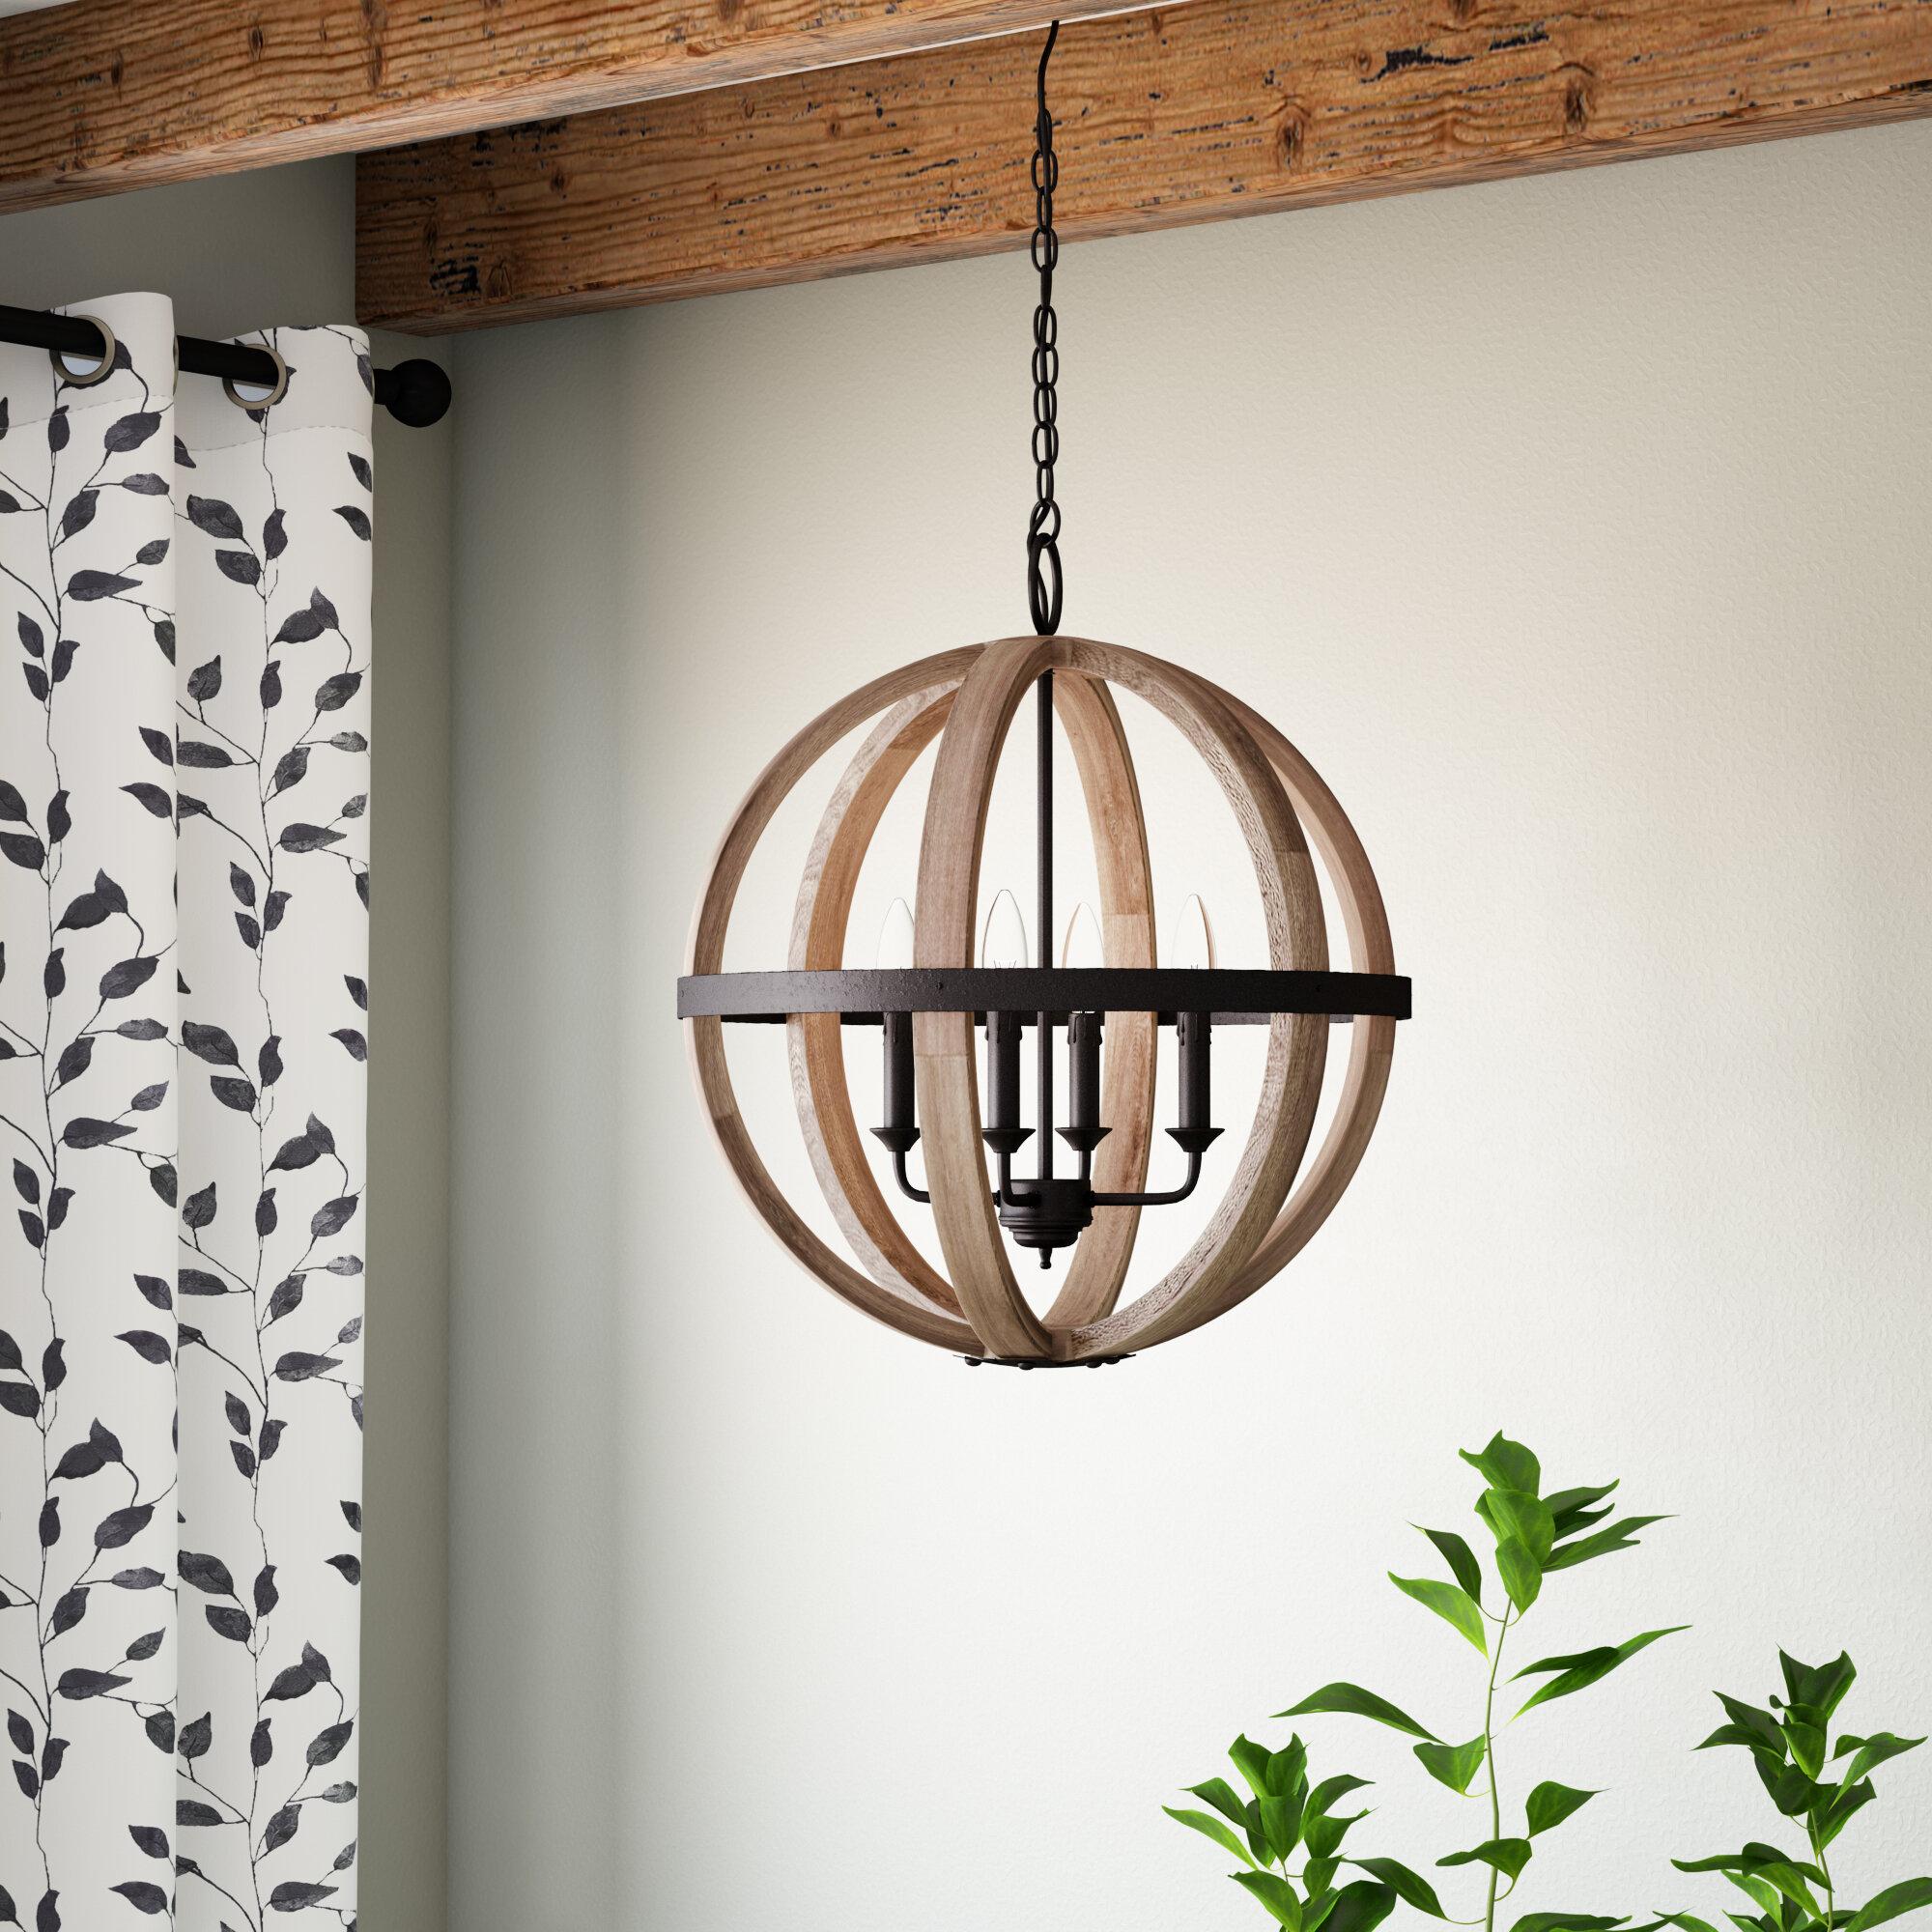 Gracie oaks caley 4 light globe chandelier reviews wayfair